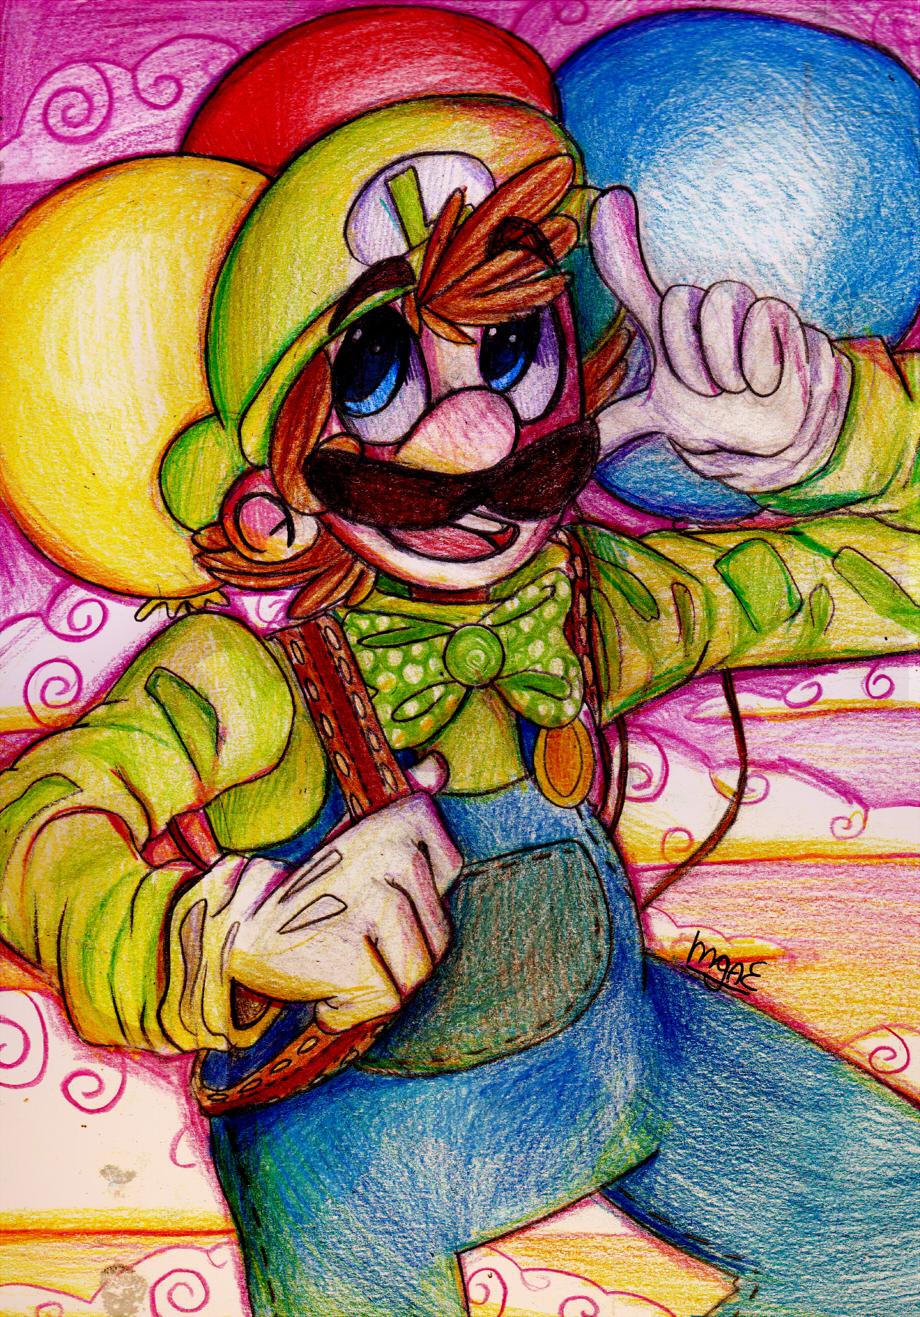 Luigi's Balloon World by mariogamesandenemies